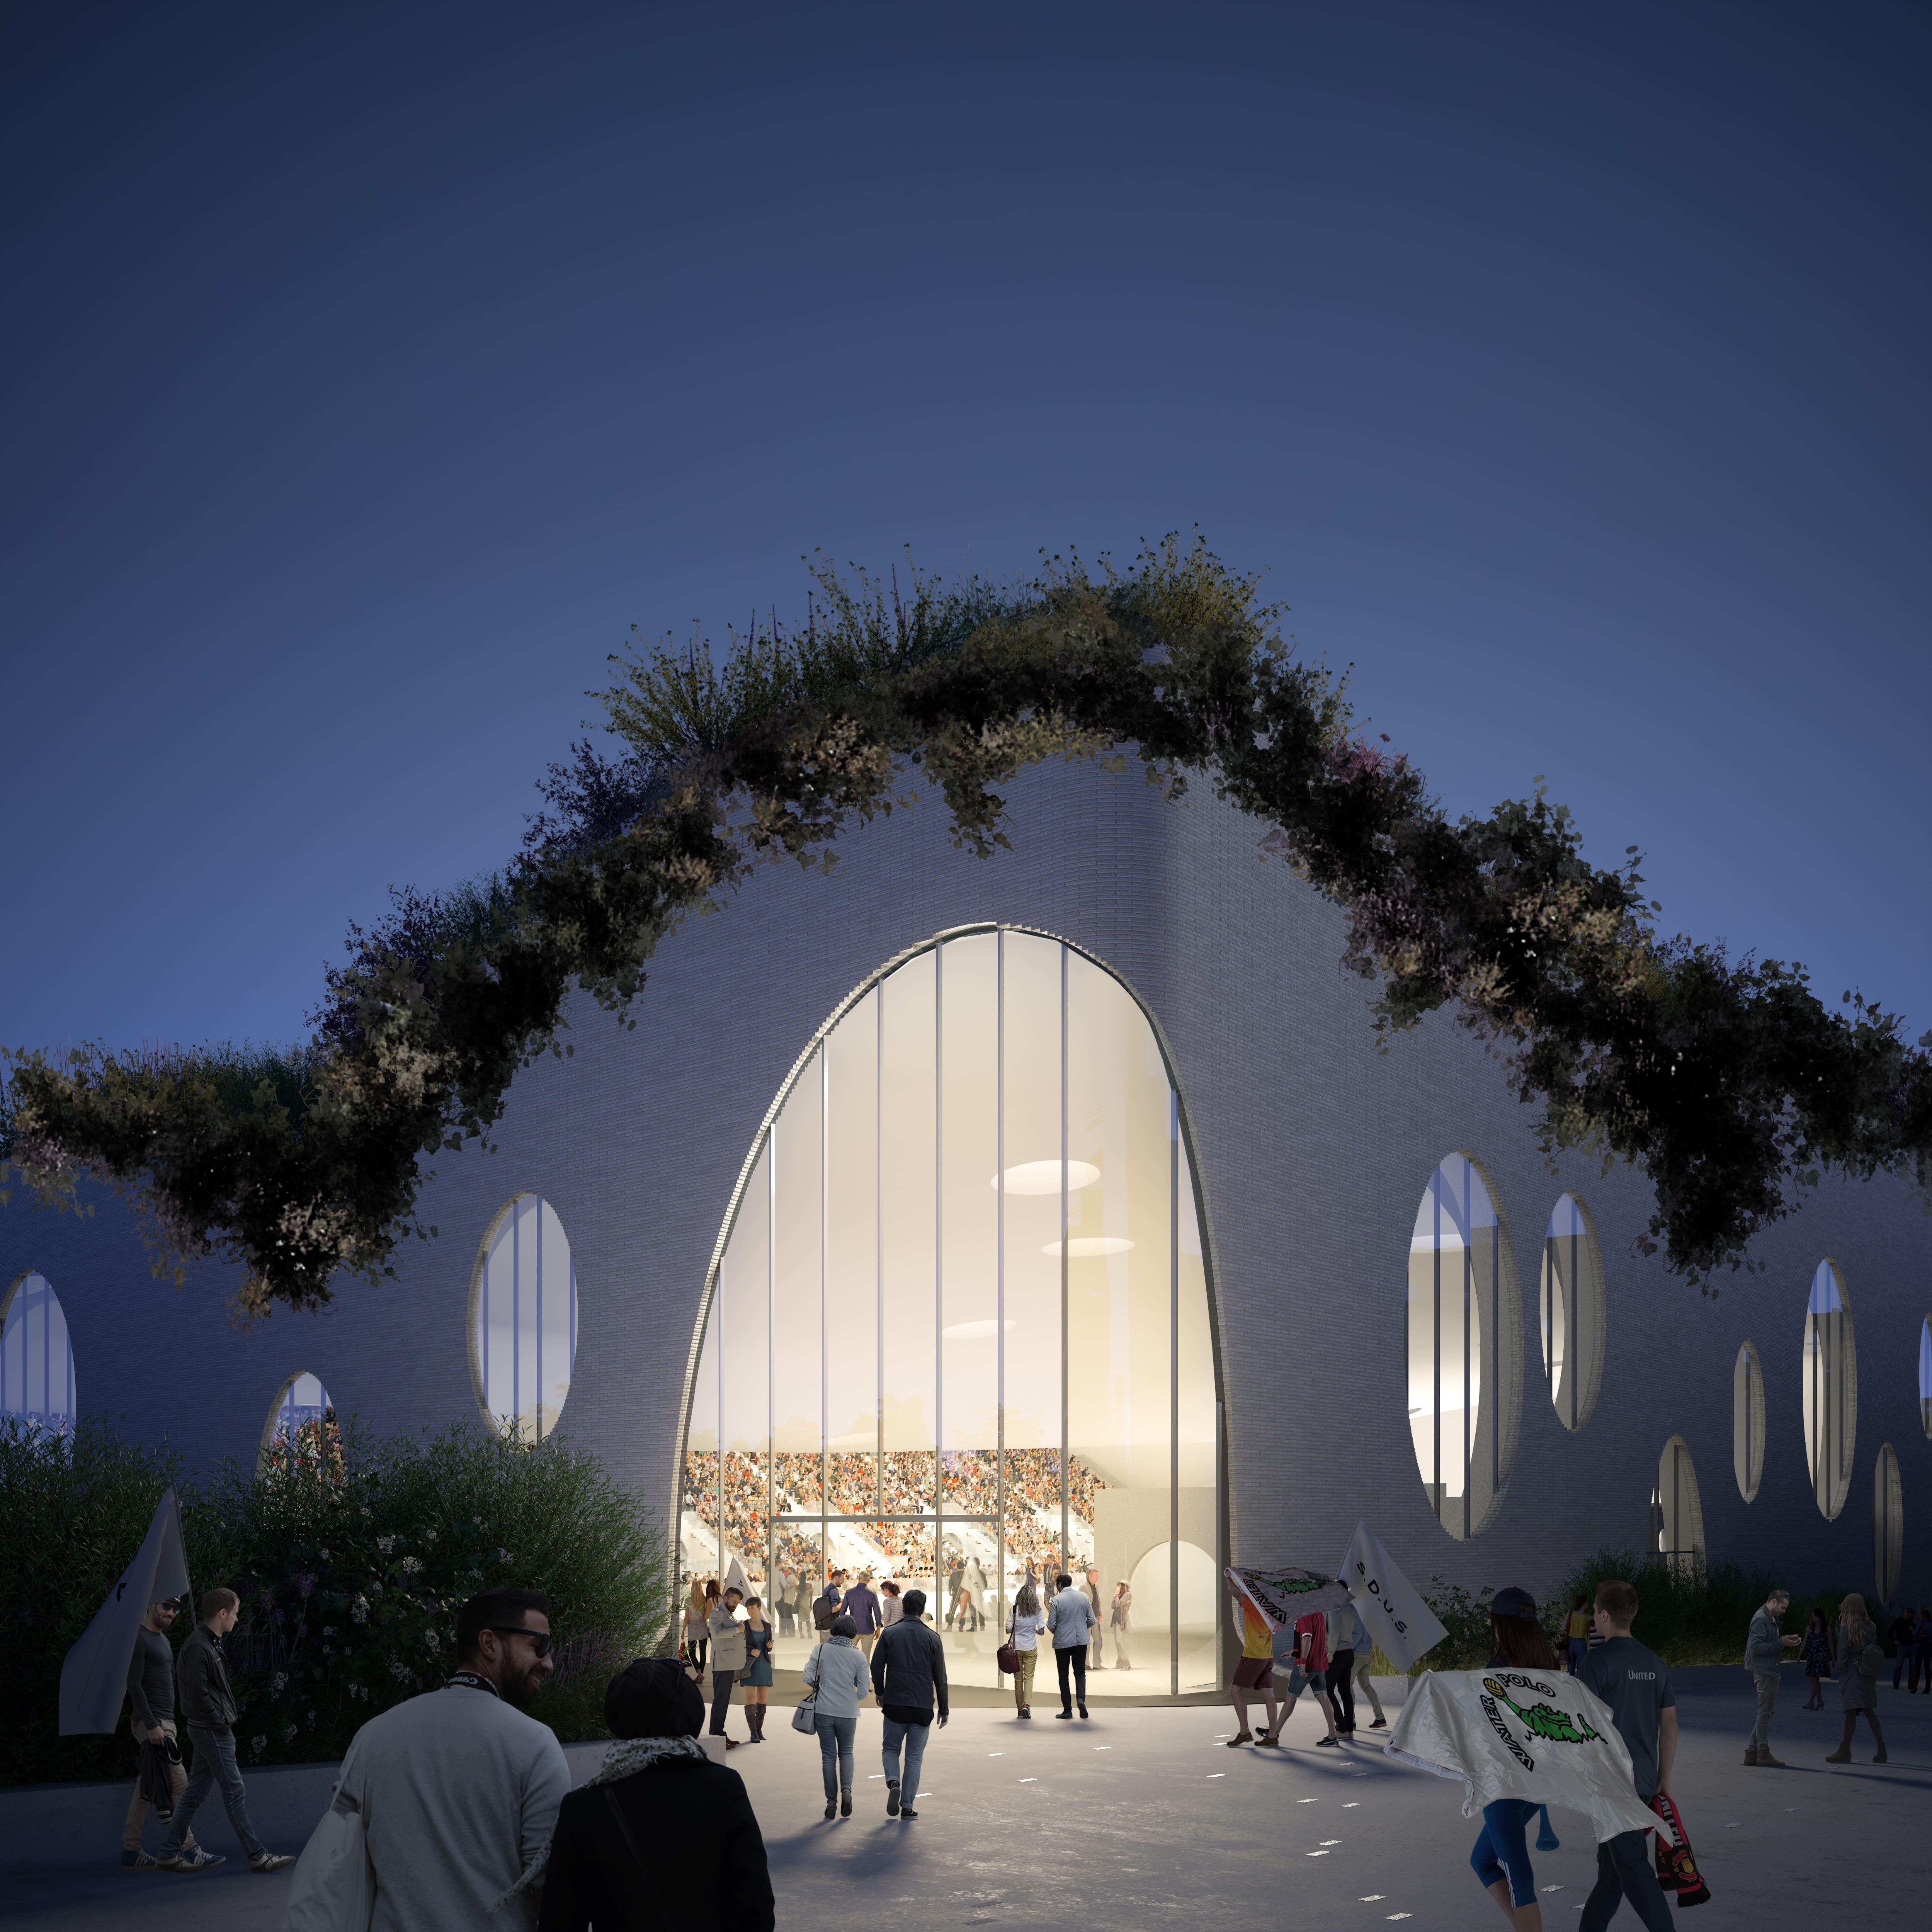 https://www.amc-archi.com/mediatheque/4/0/9/000059904/projet-non-retenu-centre-aquatique-olympique-jo.jpg